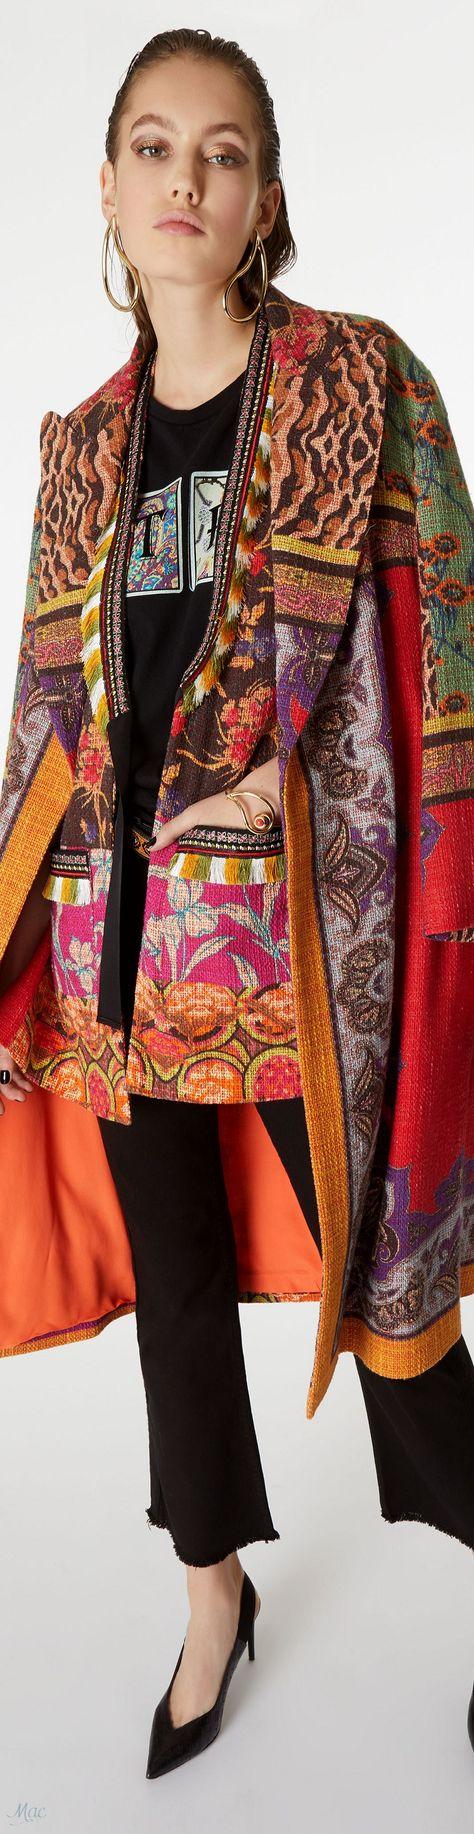 Etro Pre-Fall 2019 #womenswear #prefall2019 #Etro